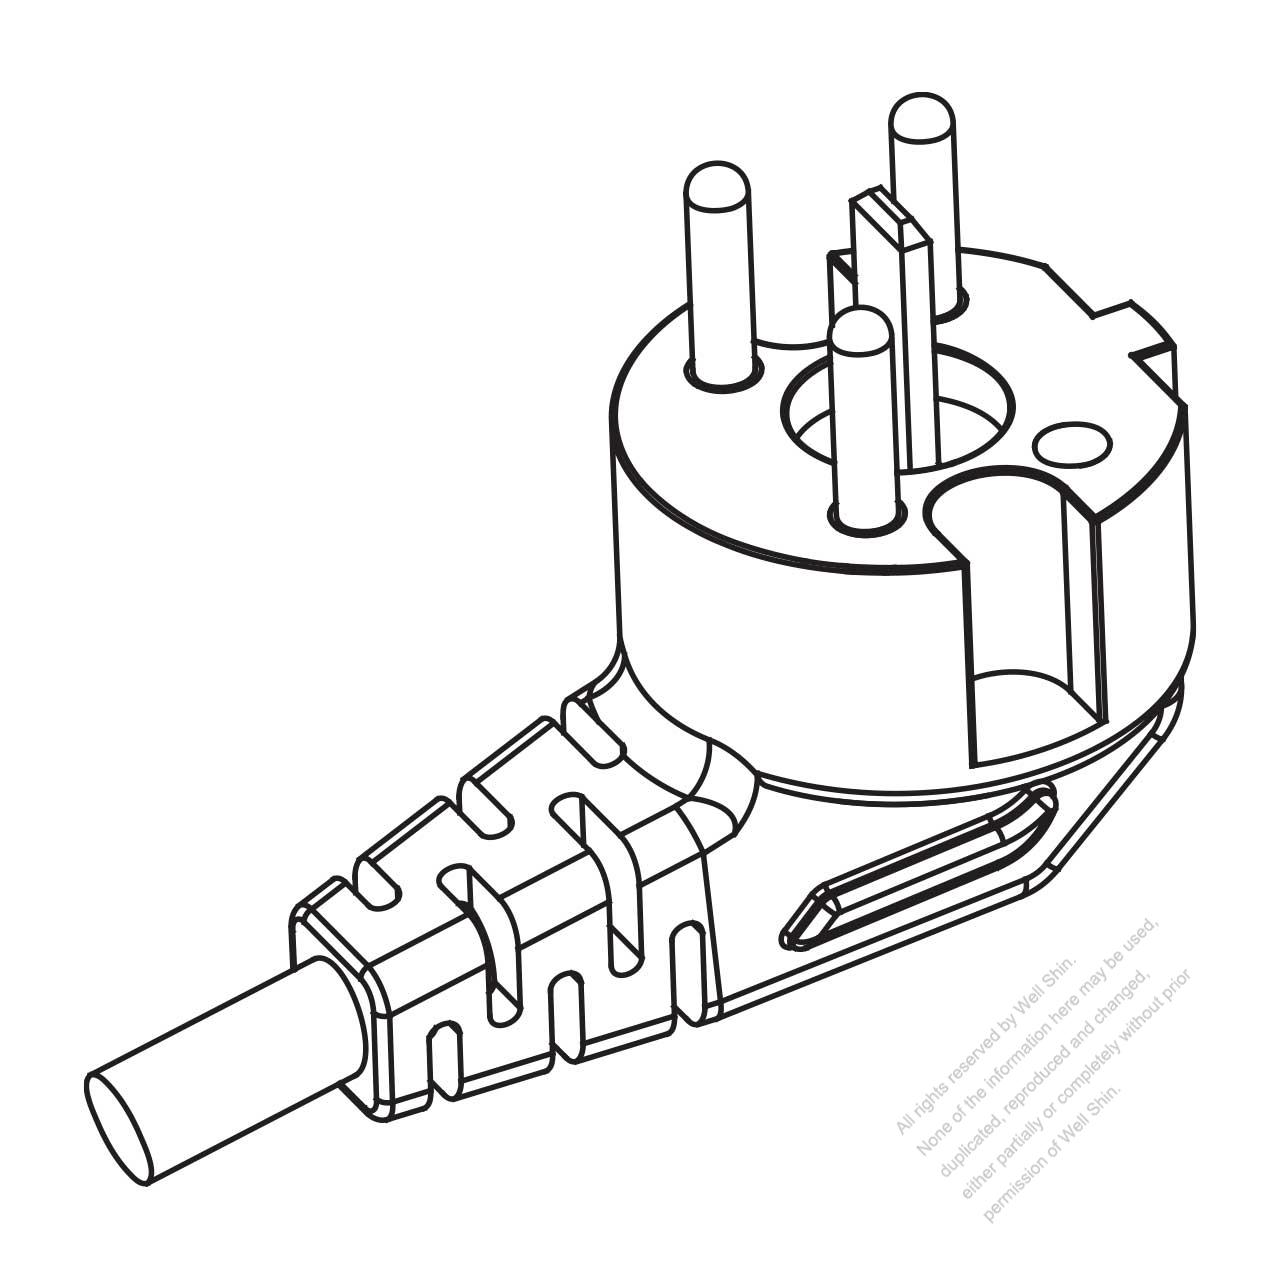 sweden 5 pin elbow ac plug 16a 230 400v well shin technology co 2 Pole Plug sweden 5 pin elbow ac plug 16a 230 400v